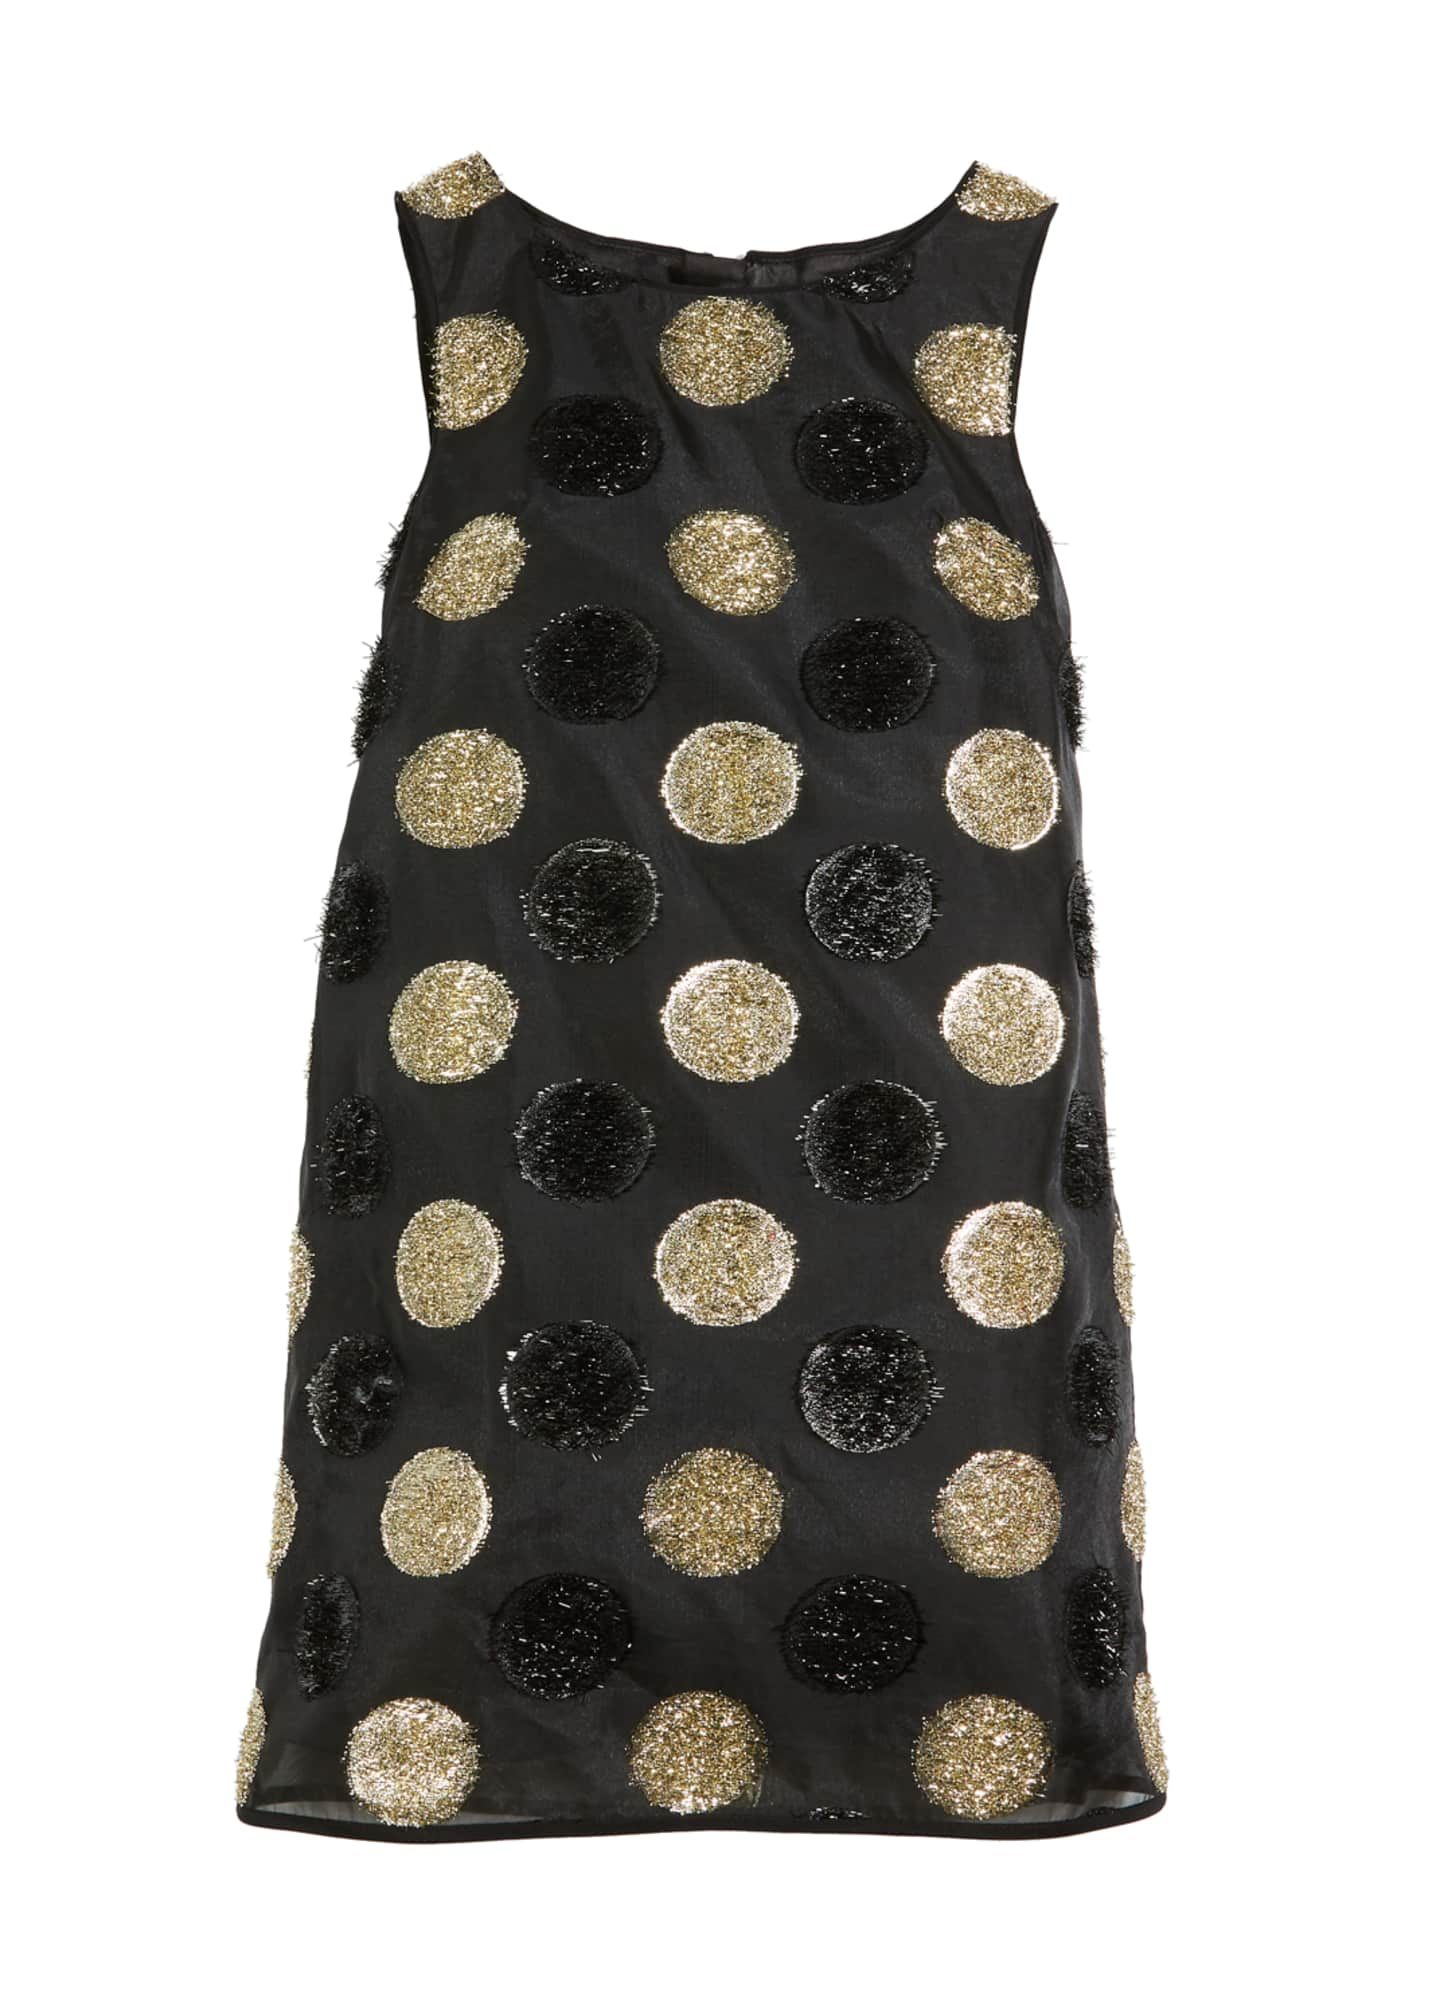 Milly Minis Textured Polka-Dot Angular Shift Dress, Size